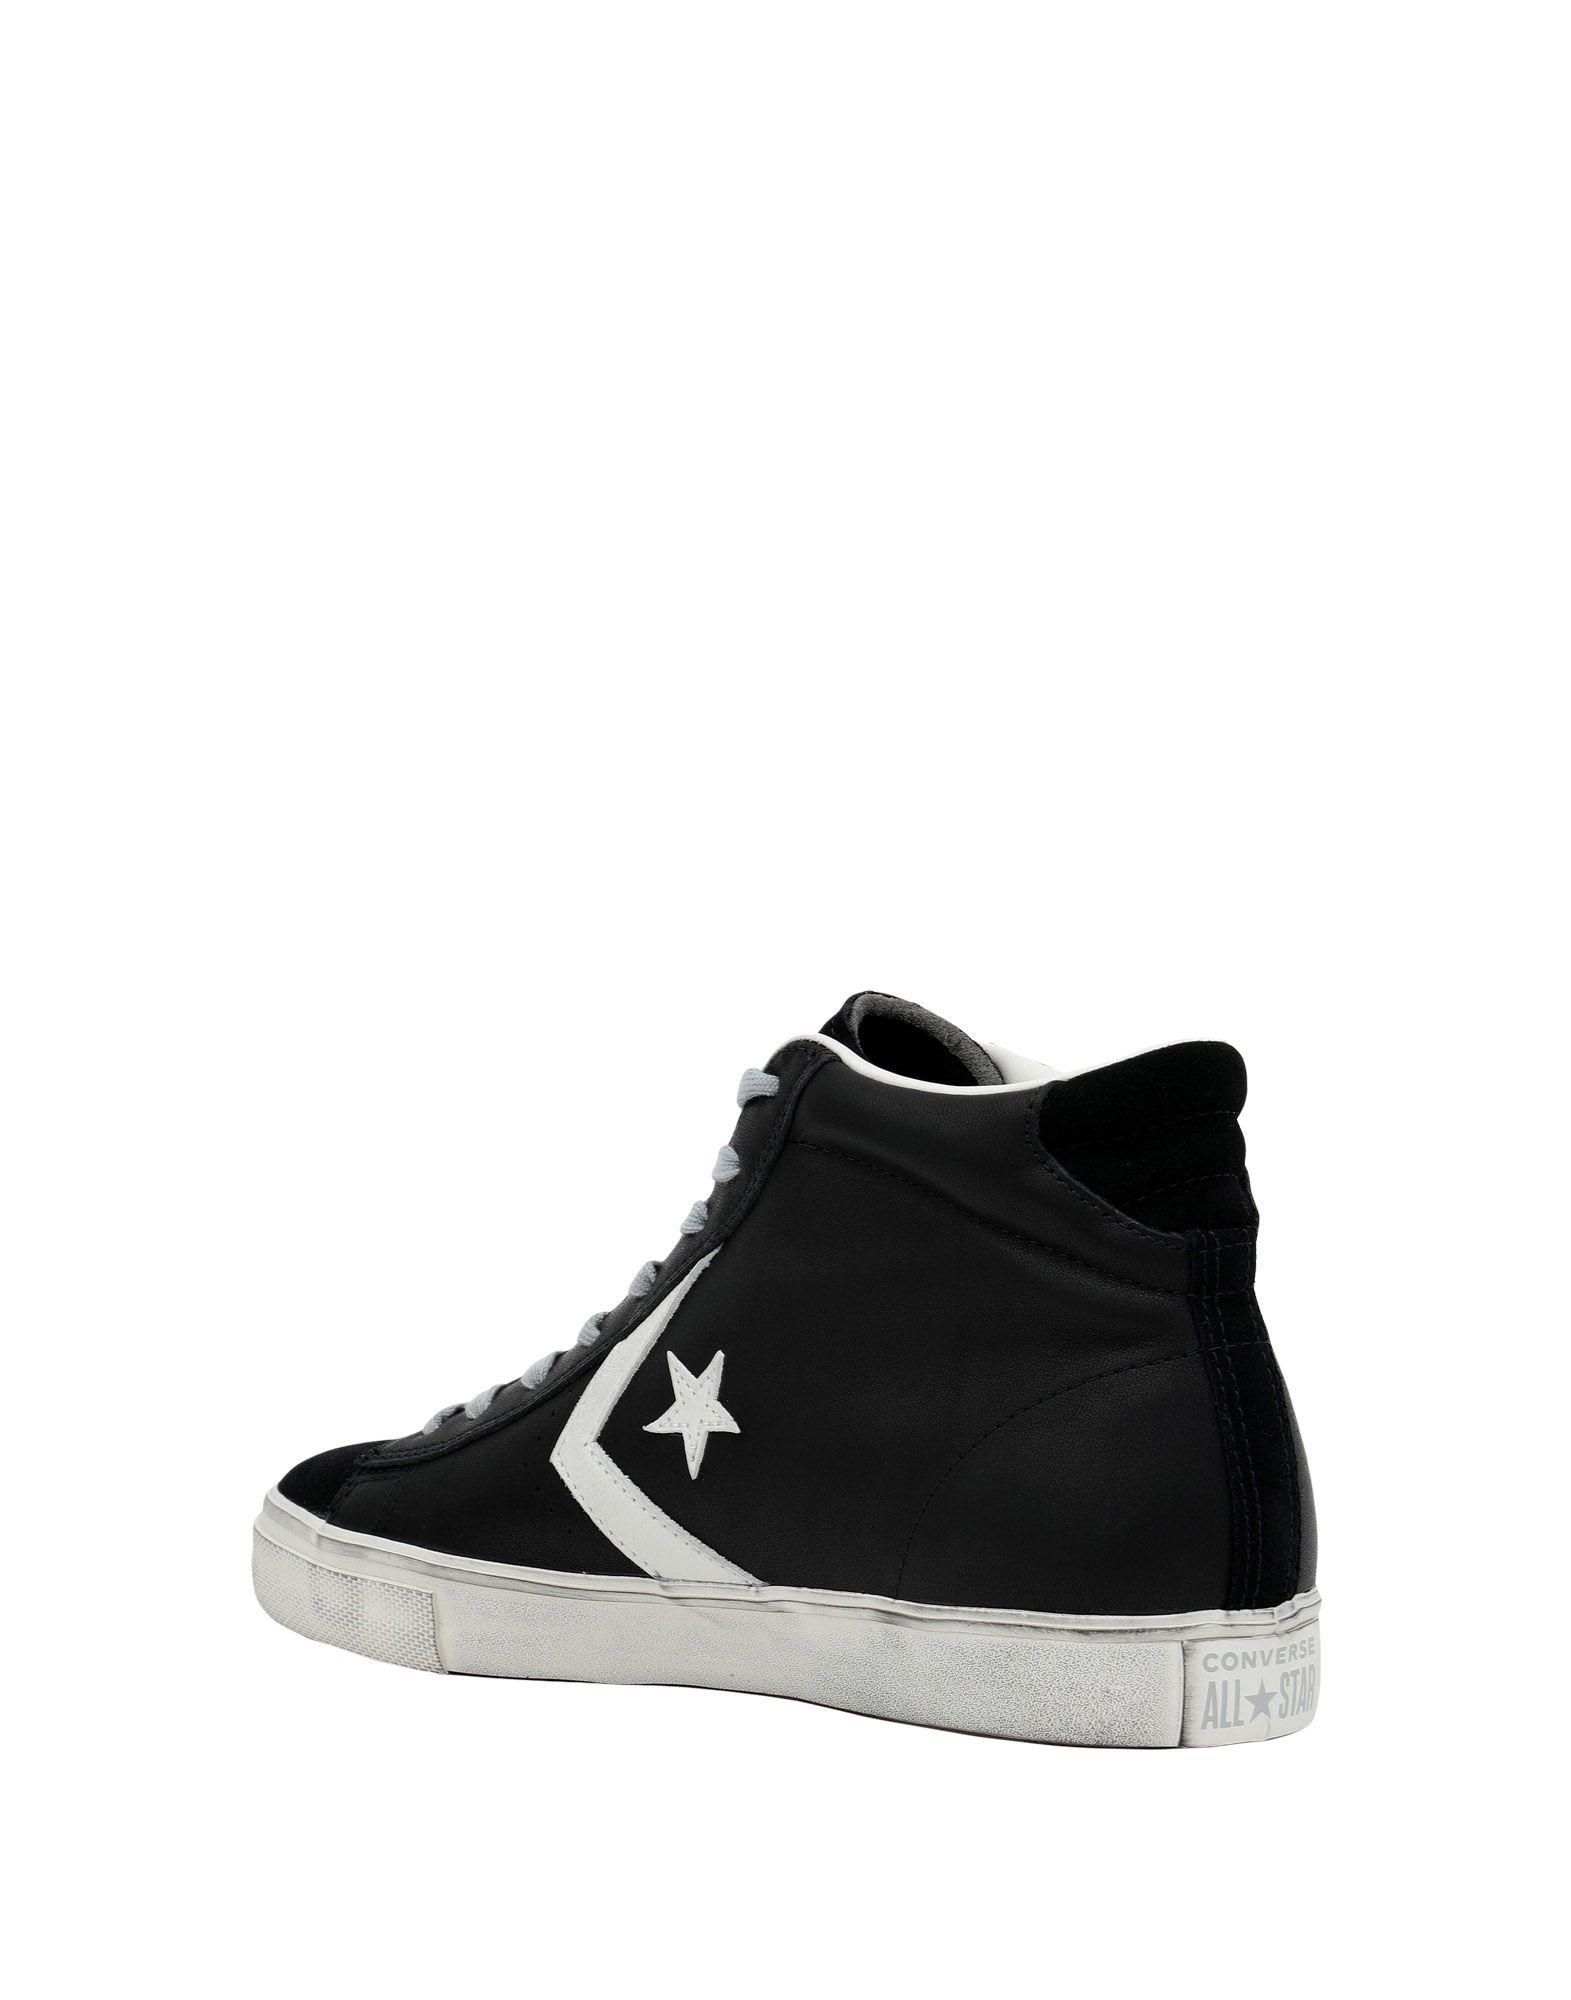 Converse All Star Pro Leather - - - Sneakers - Men Converse All Star Sneakers online on  United Kingdom - 11574642RU 6234e3